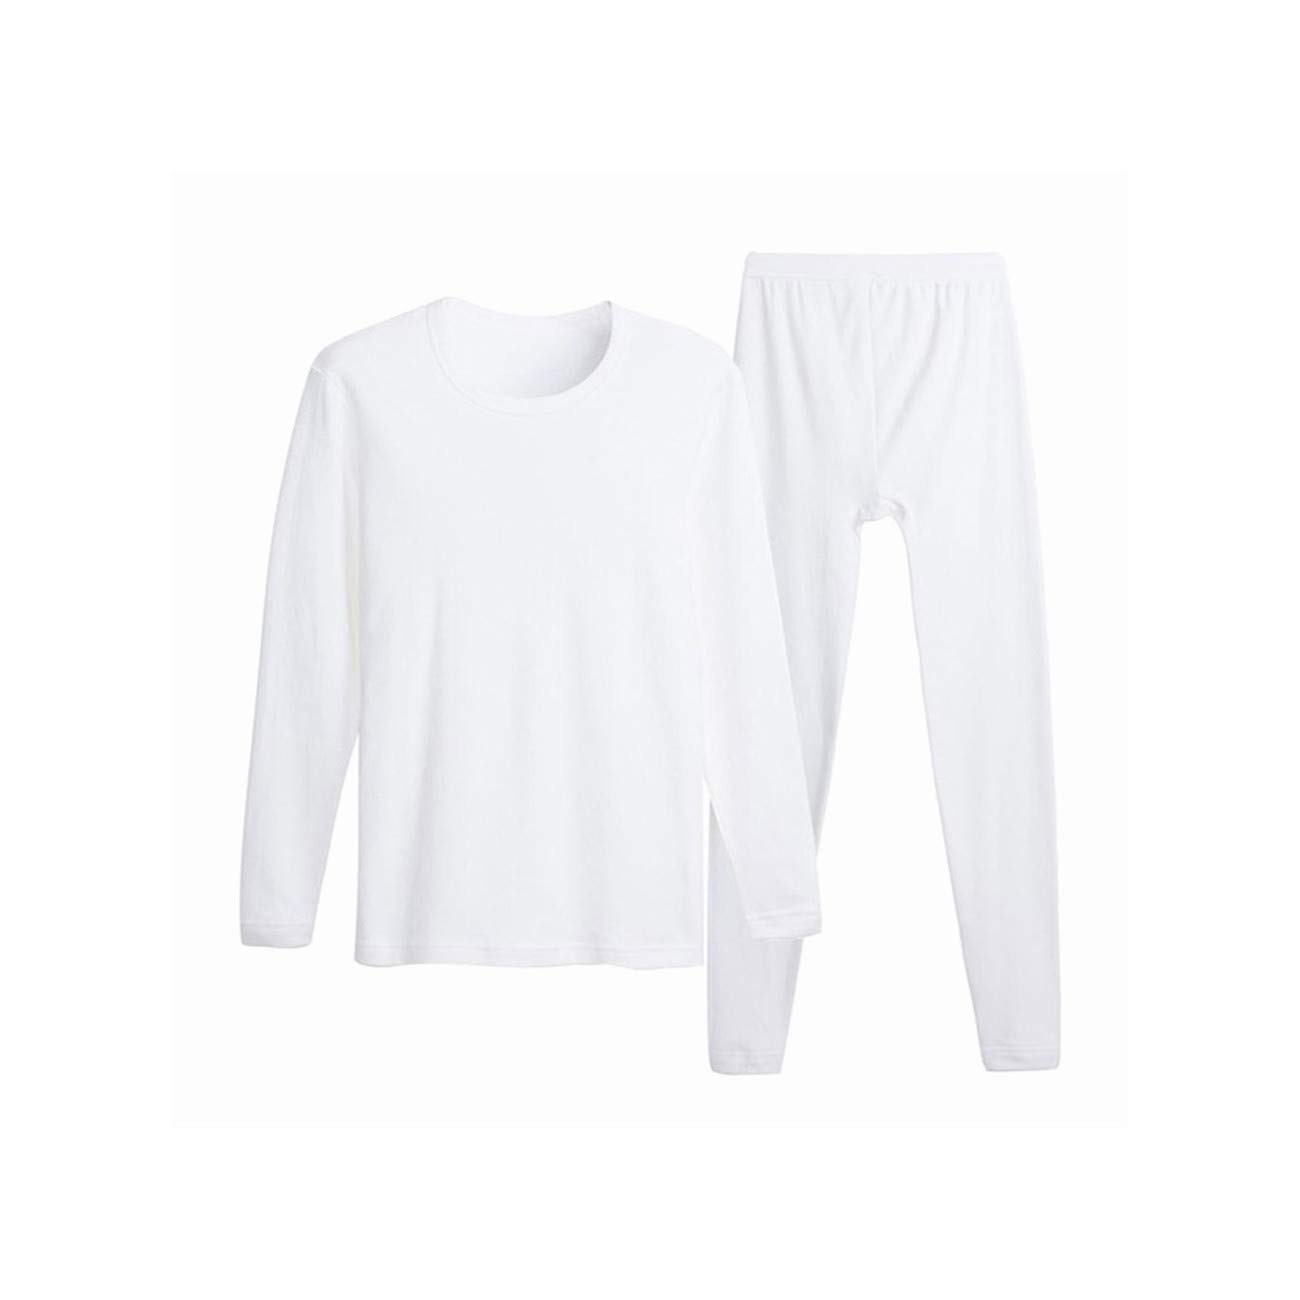 Cotton Men's O Neck Warm Set Ultra Soft Thermal Underwear Undershirt Pants Pajama,White,L by CHENGYA